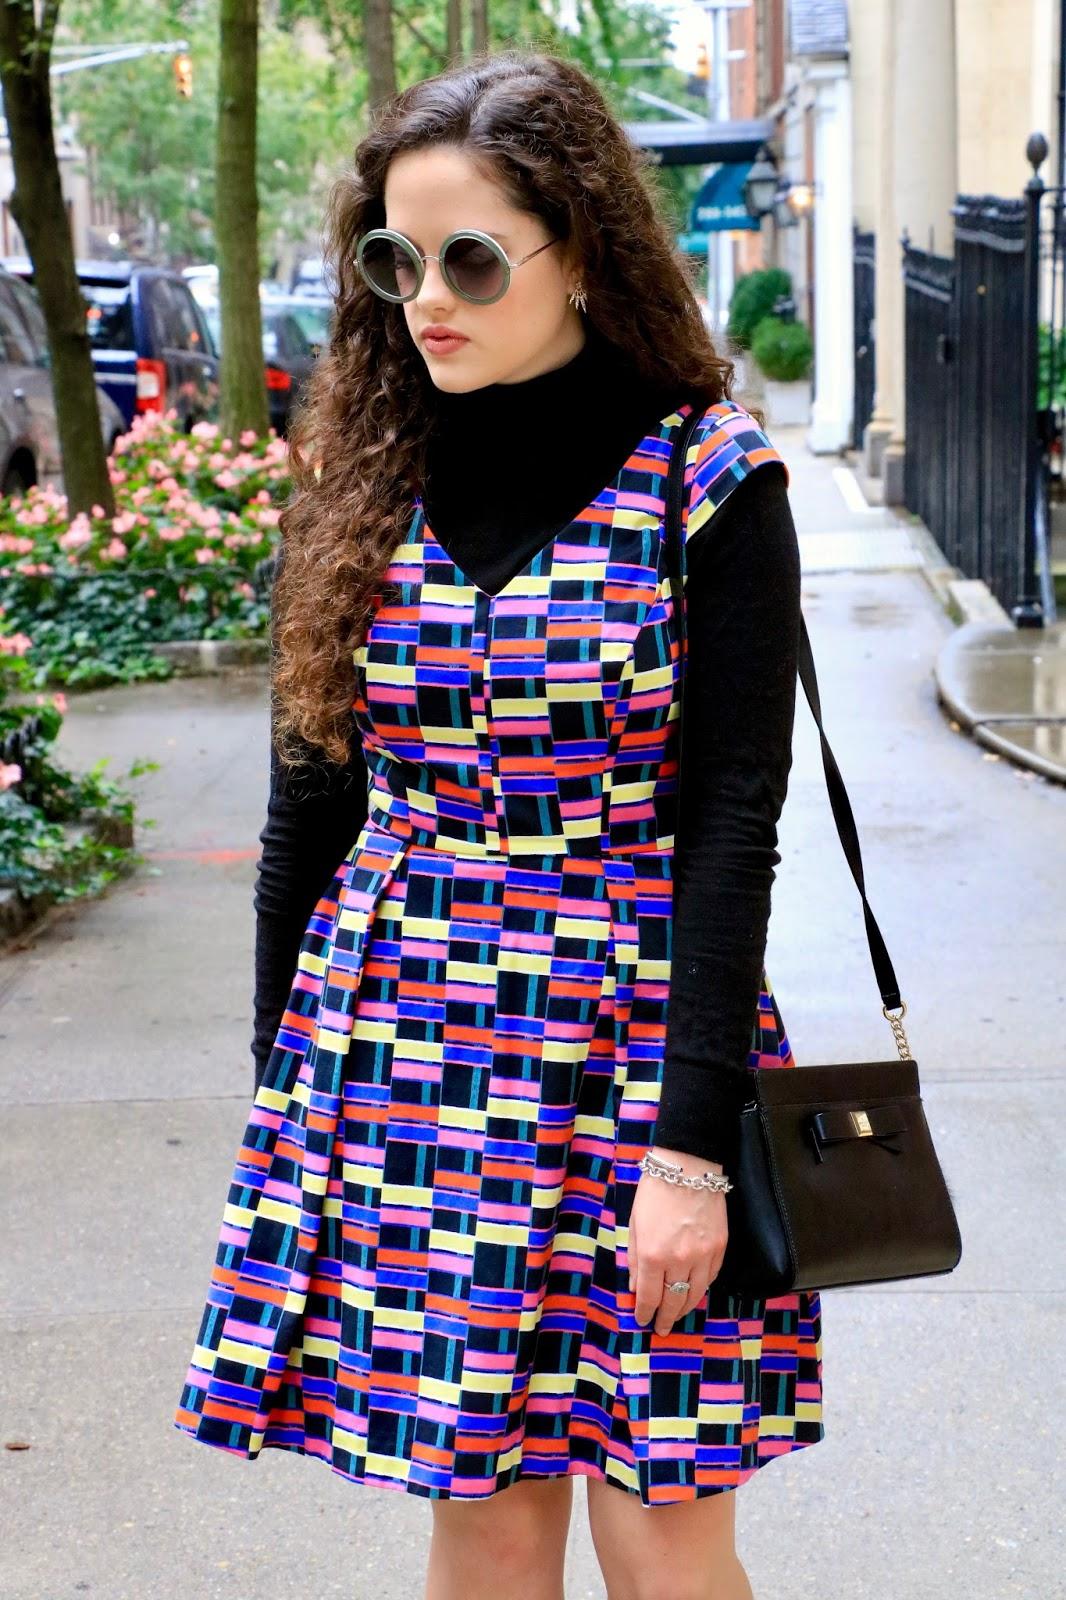 turtleneck layered under dress